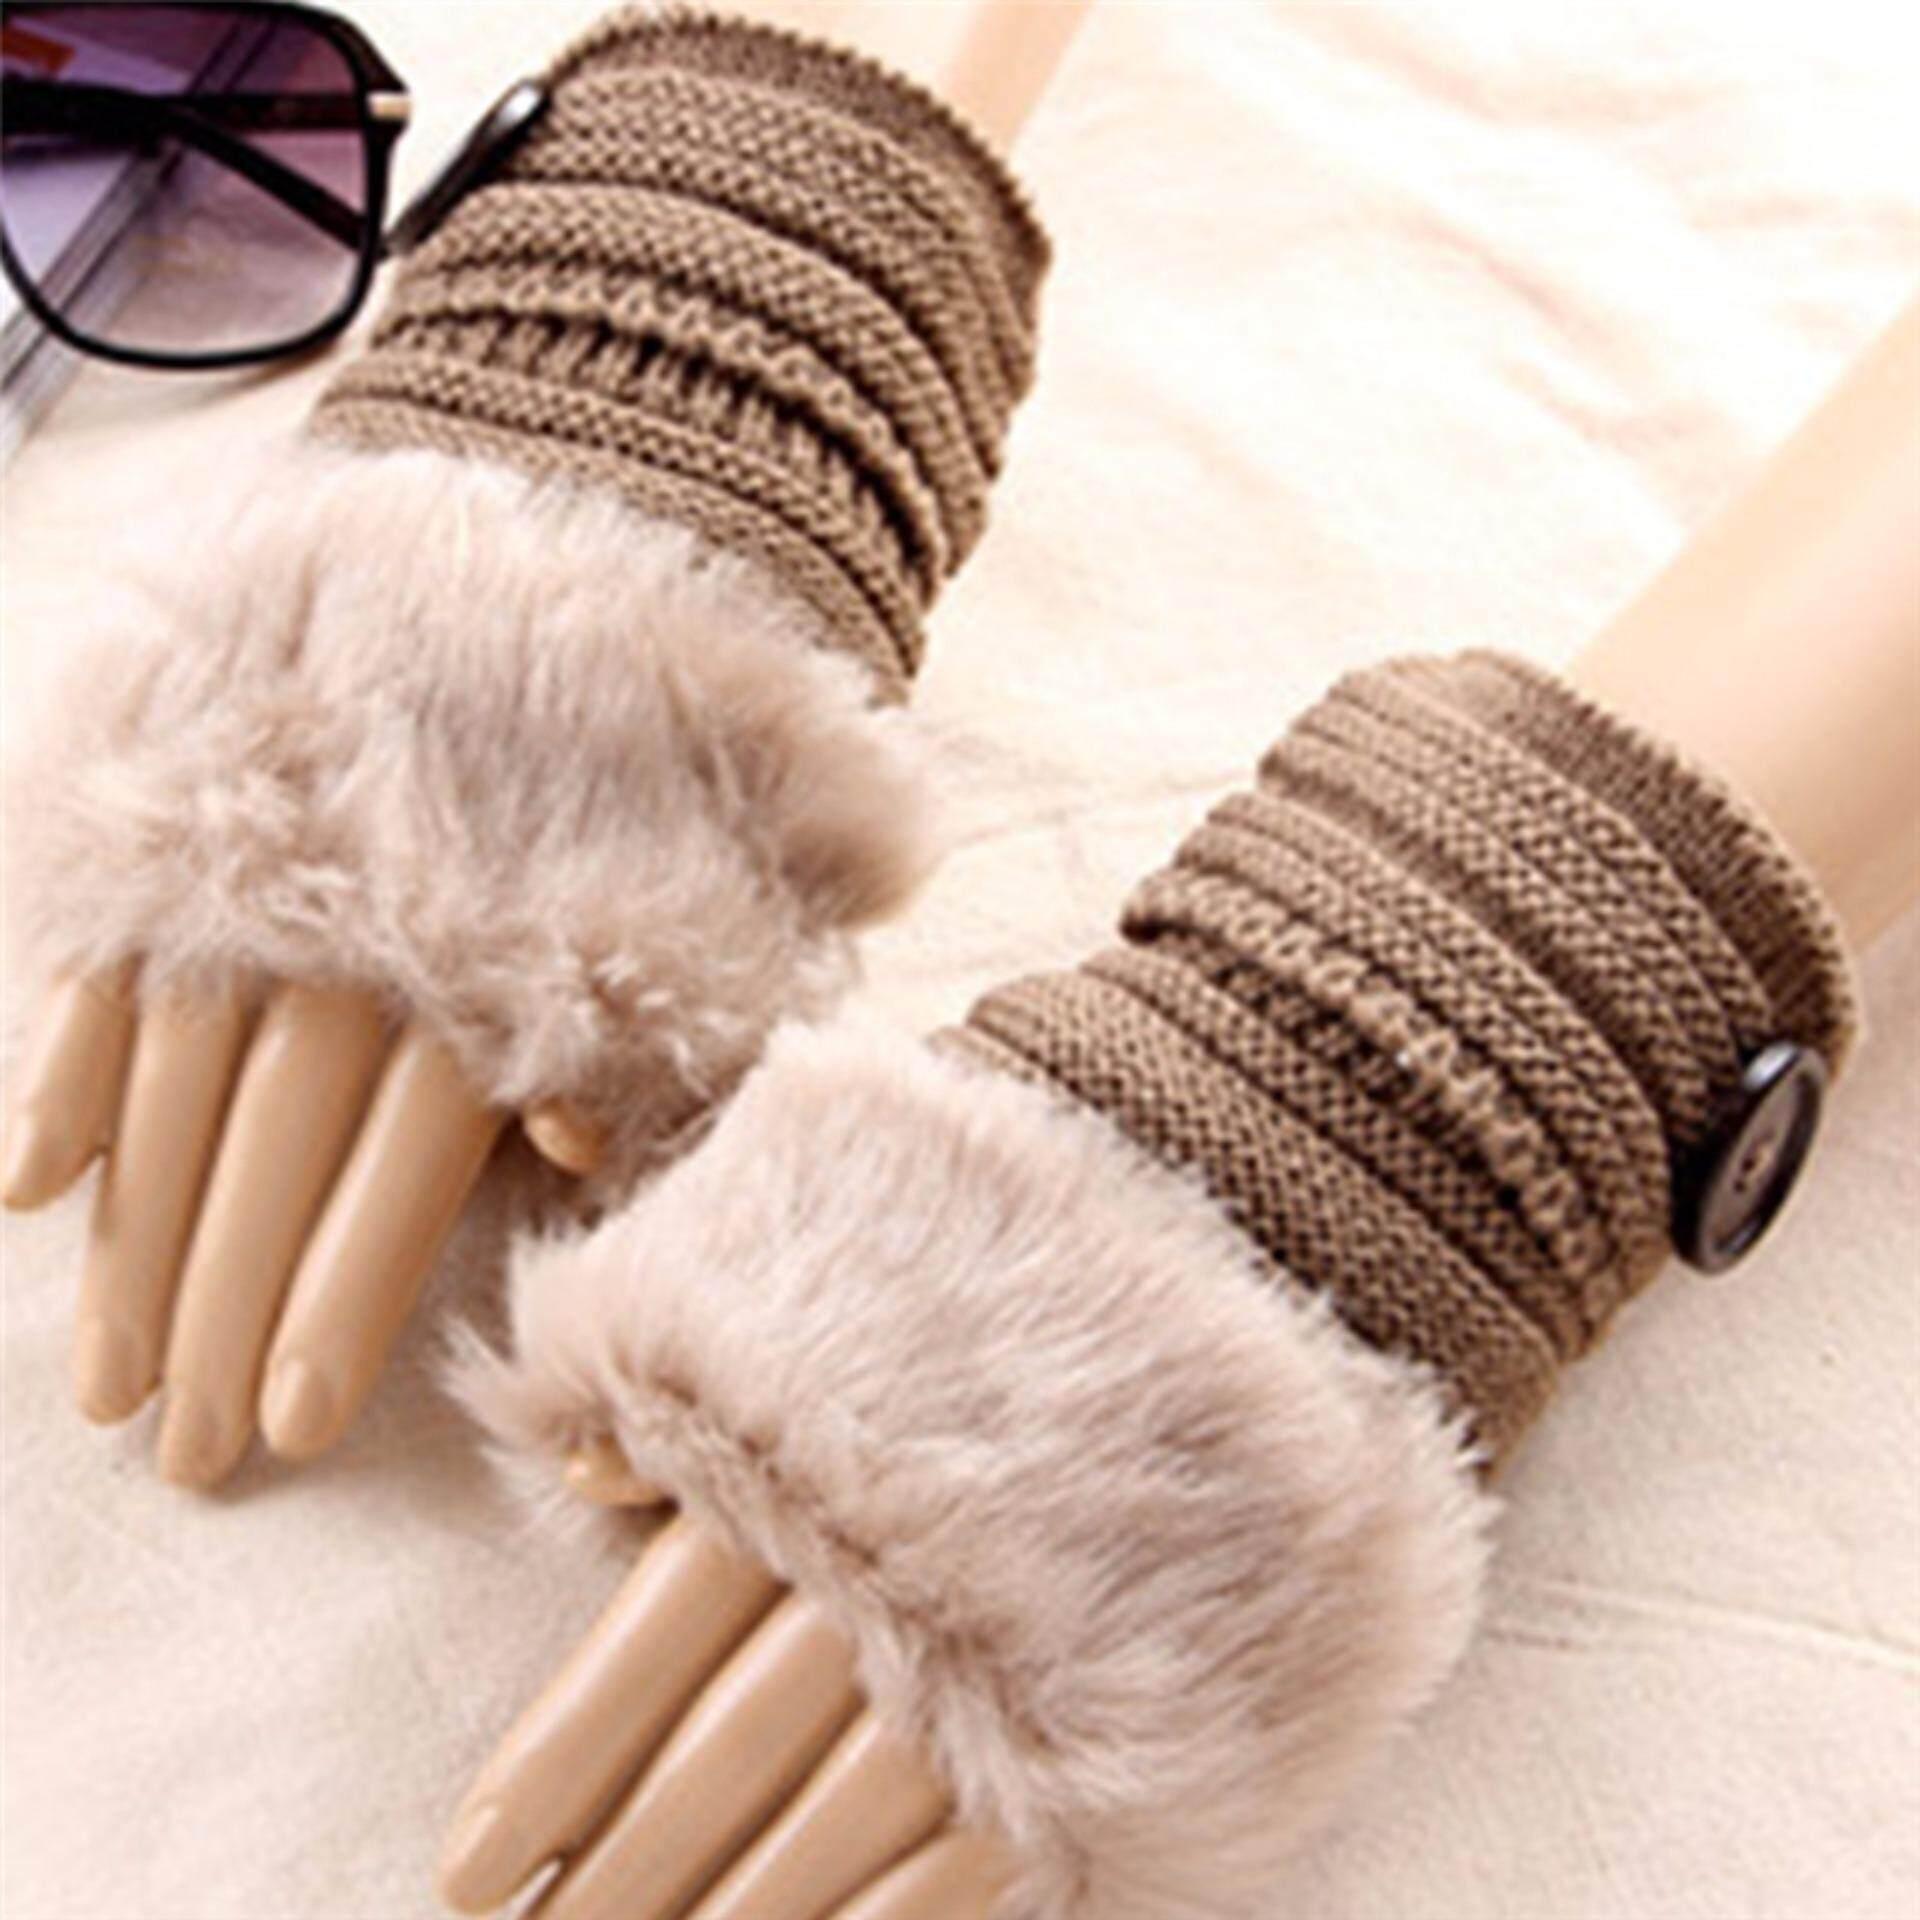 Xiner Fashion Wanita Cute Rajutan Tanpa Jari Sarung Tangan Musim Dingin Lembut Hangat Sarung Tangan Khaki